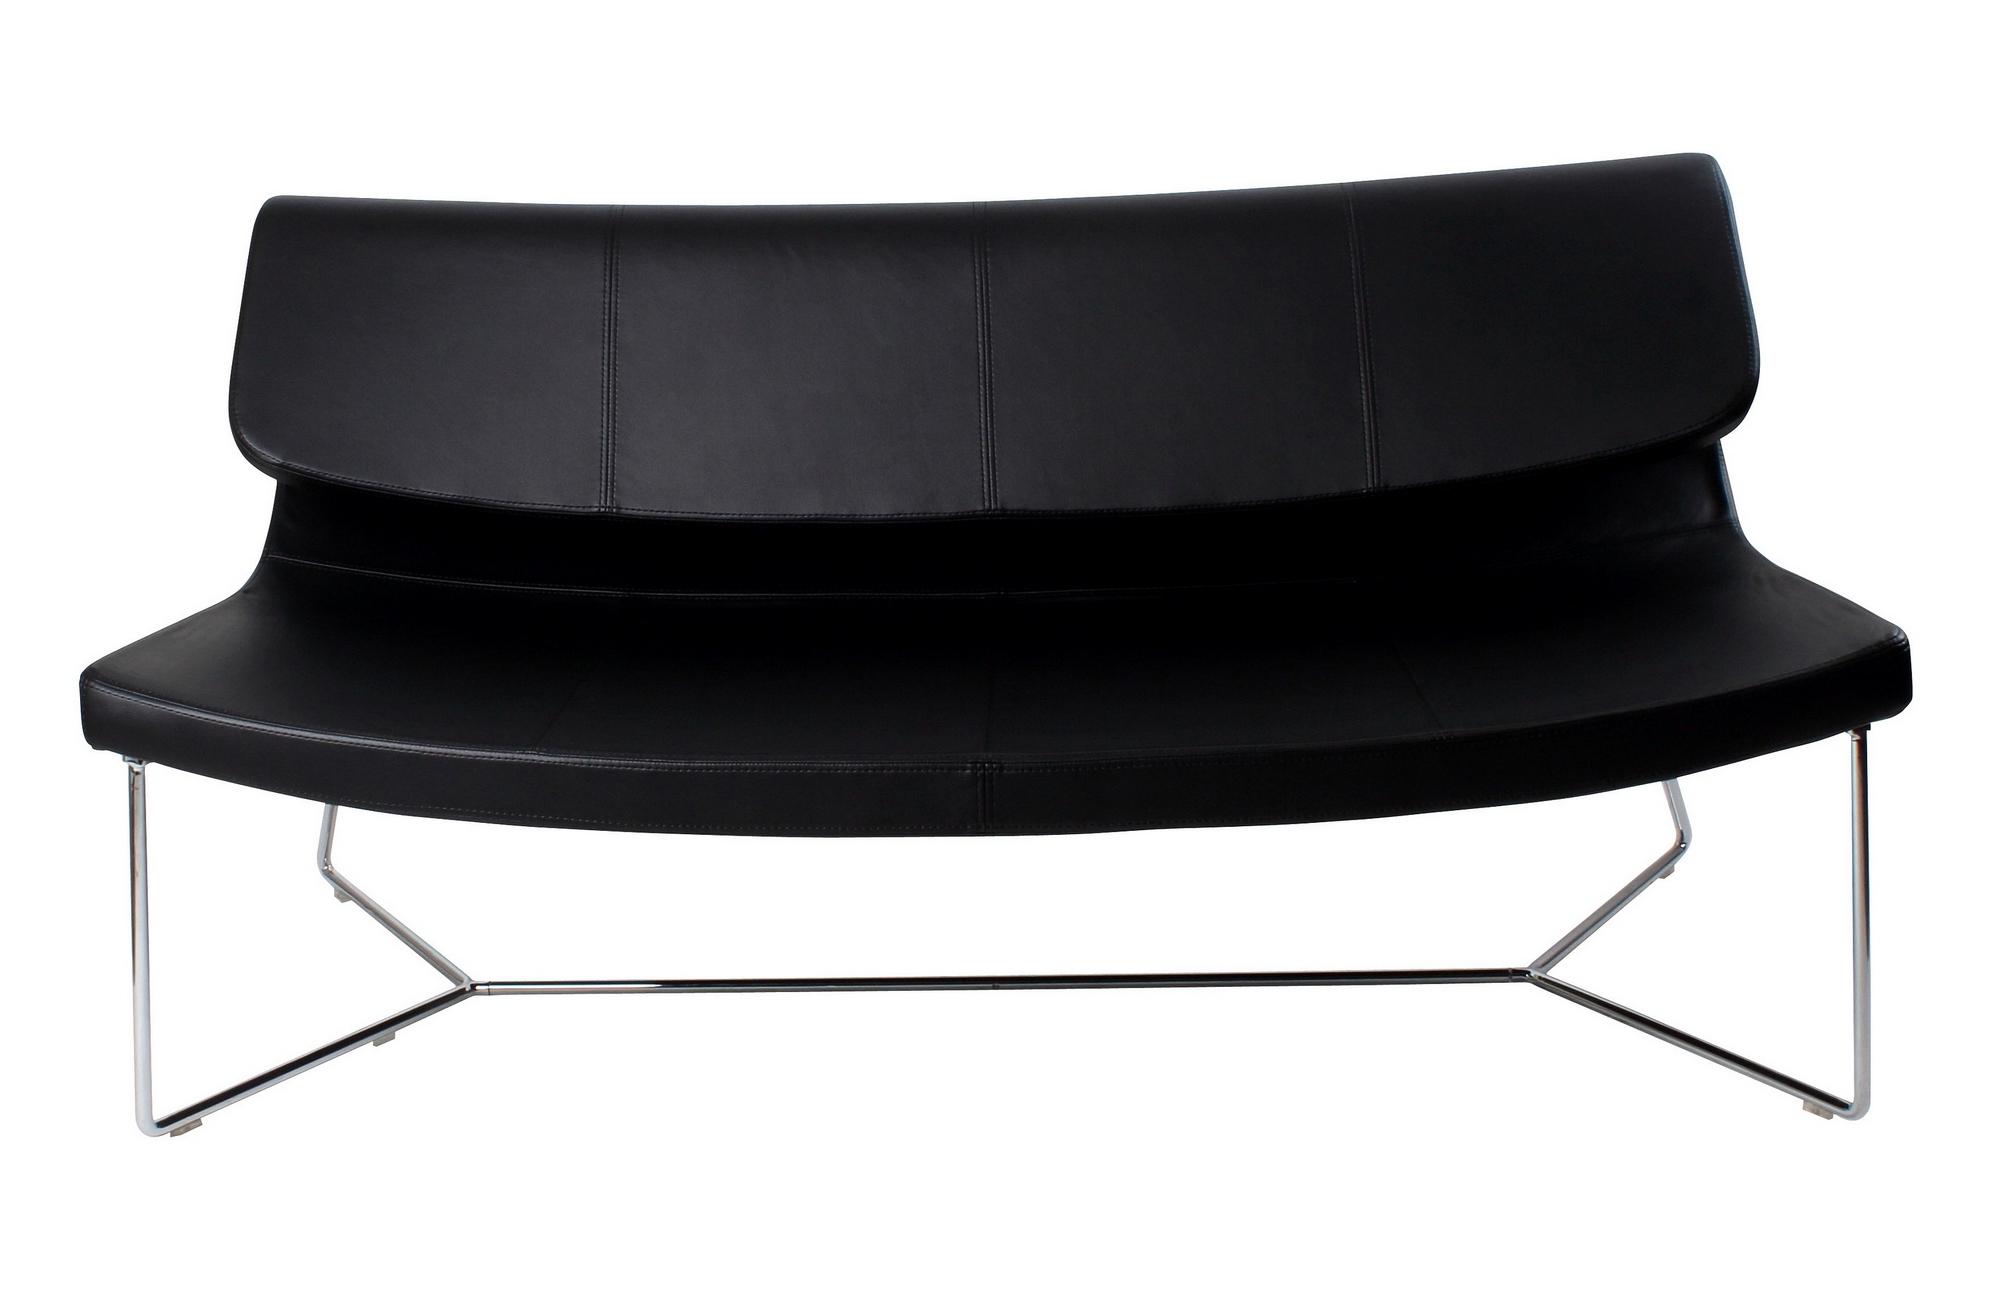 2019 Brennan Sofa Black Leatherette With Brennan Sofa Chairs (View 19 of 20)